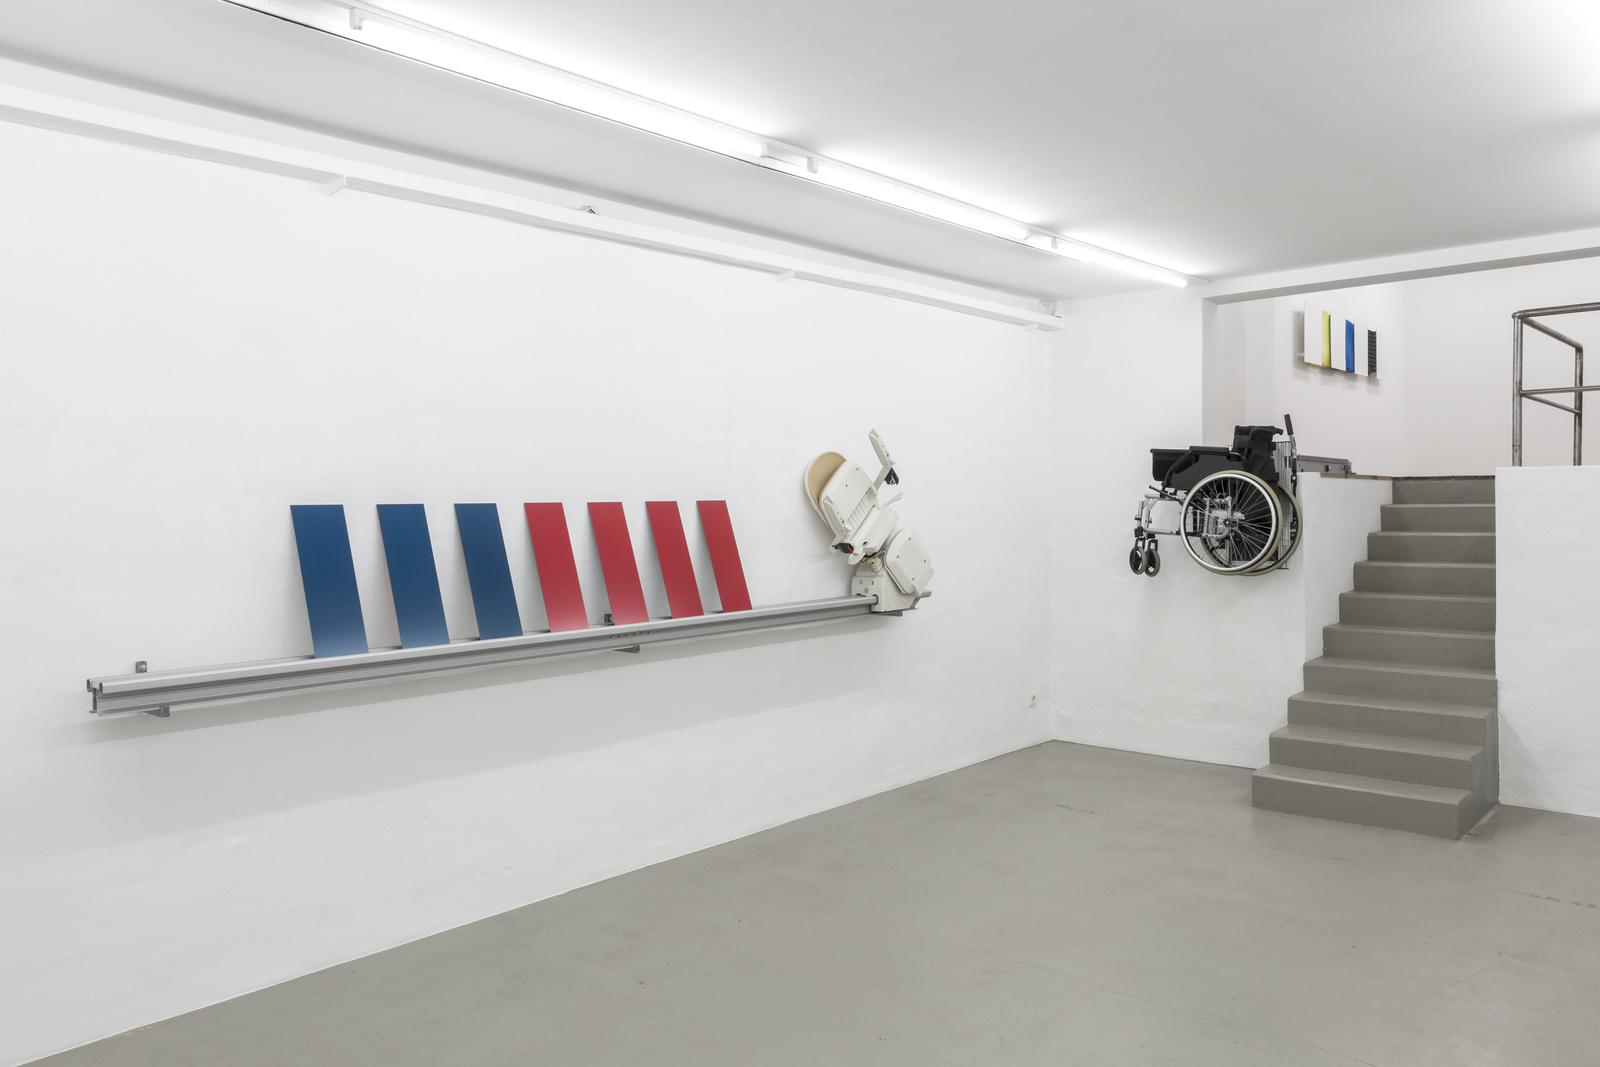 Matthias_Sohr_ACUD_gallery_03_installation_view